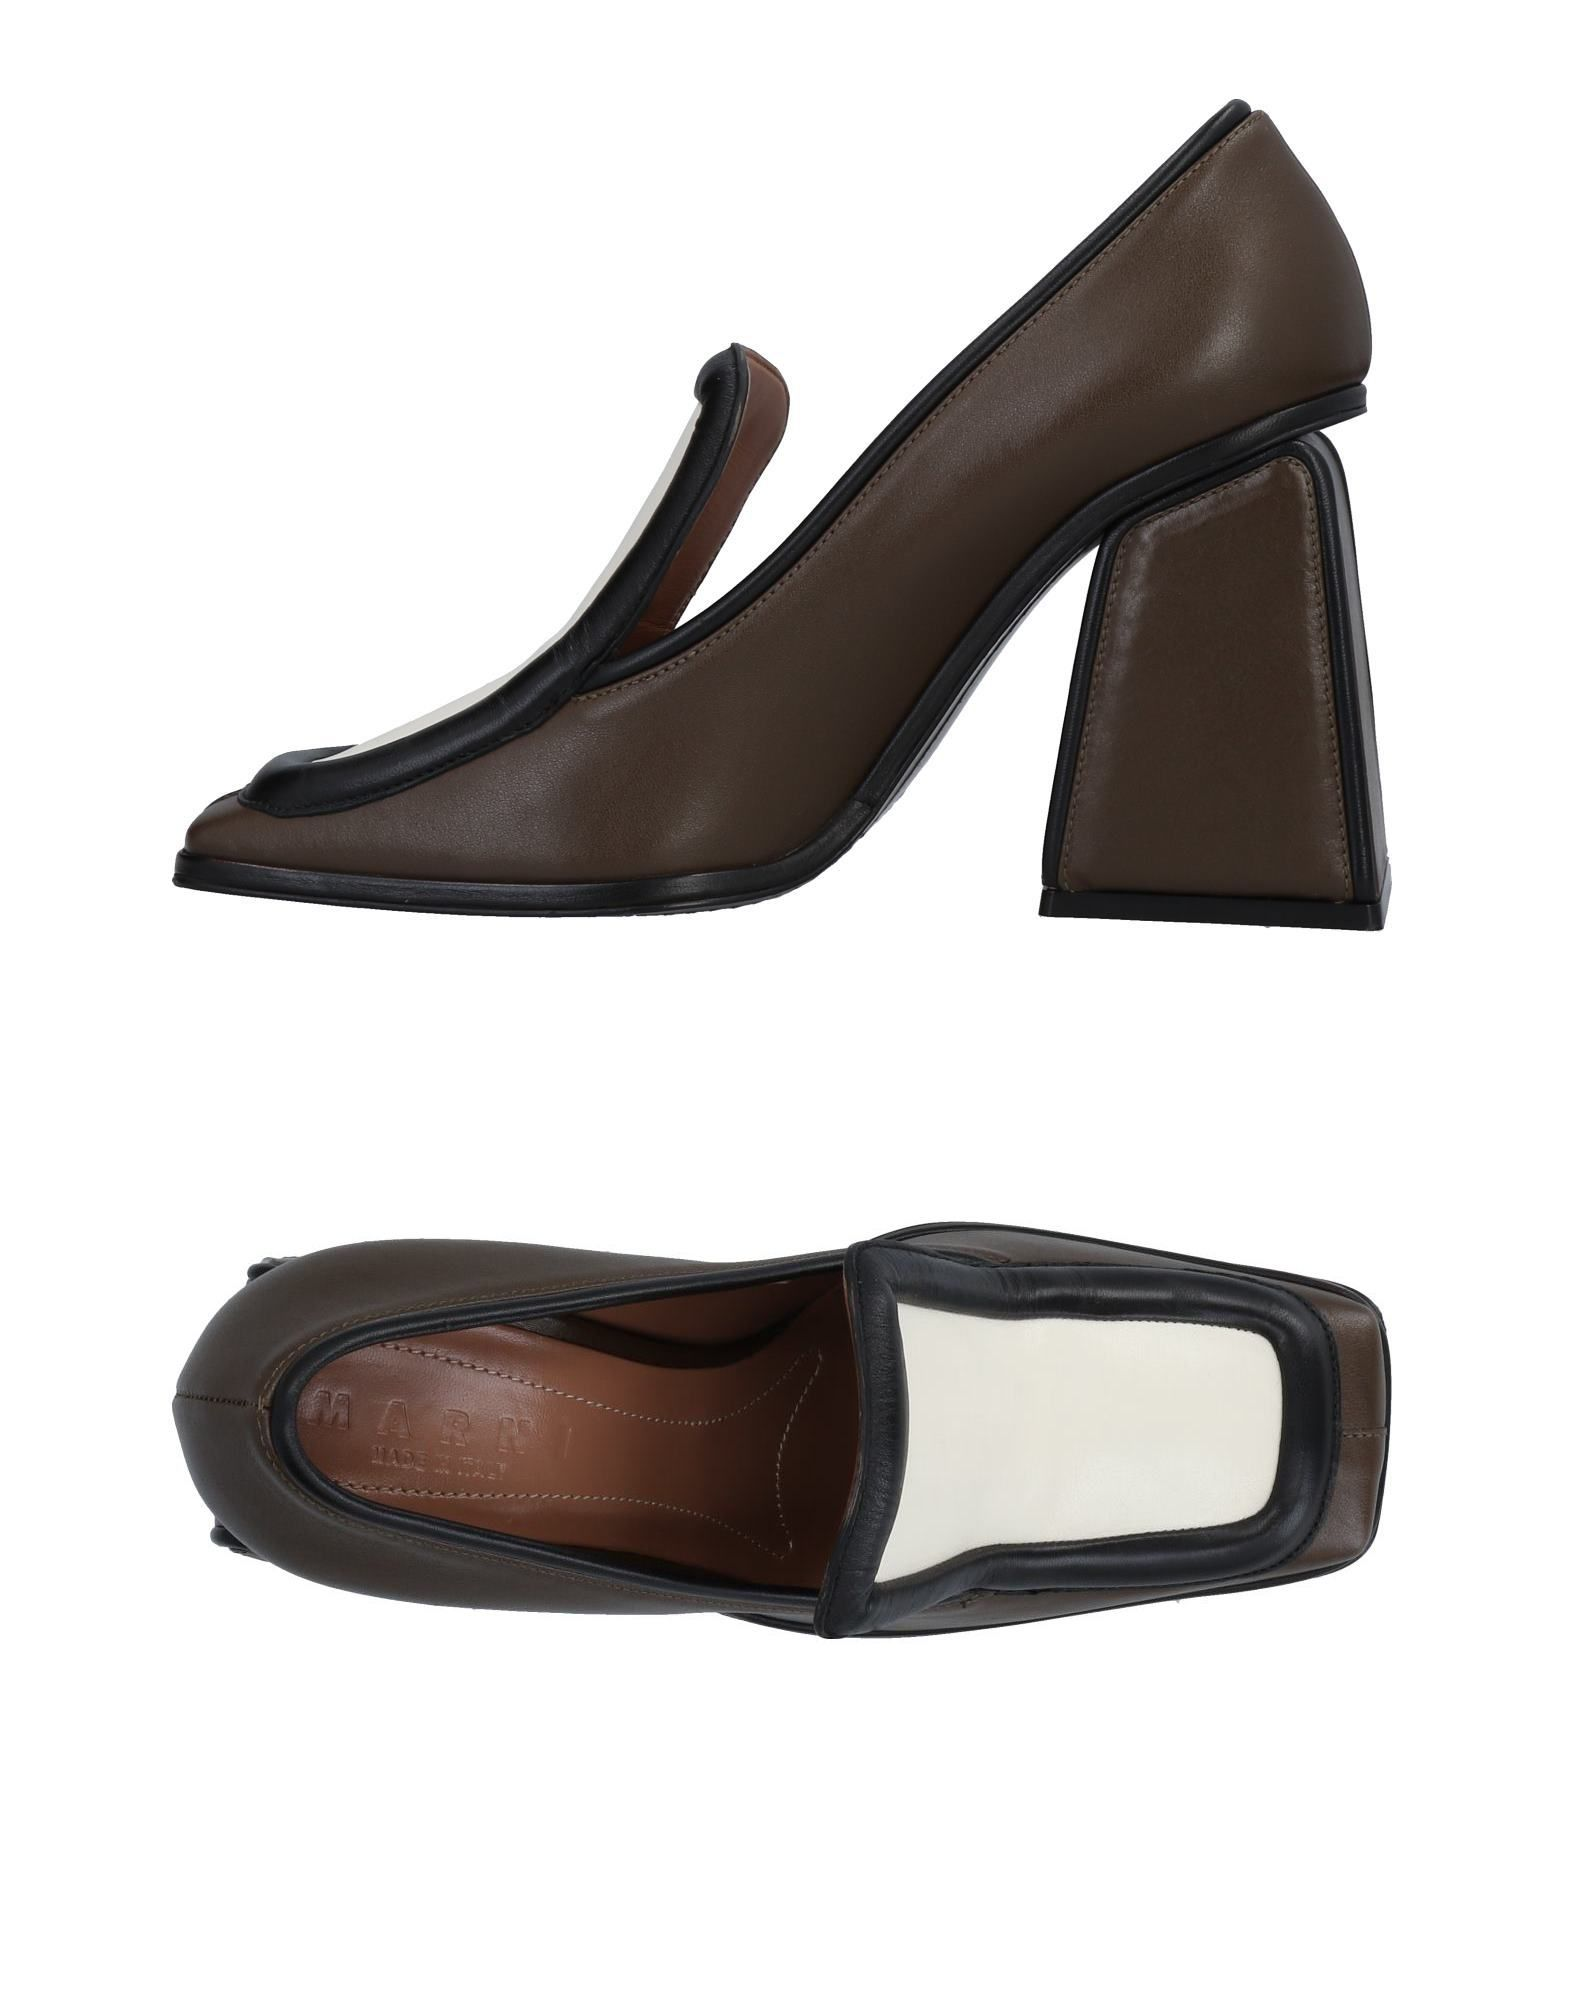 Rabatt Marni Schuhe Marni Rabatt Mokassins Damen  11481241OC a1624f